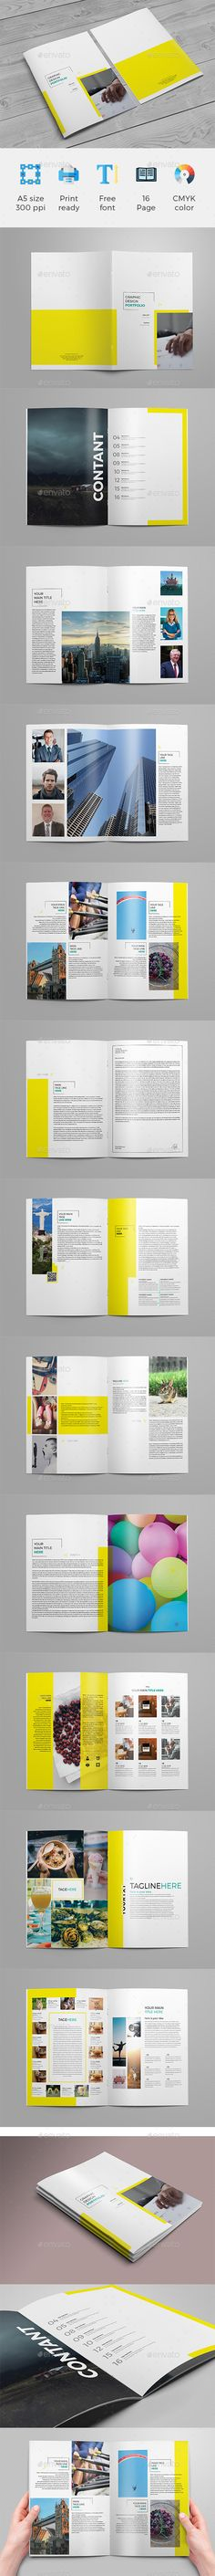 Daleman Project Portfolio Brochure template, Brochures and Template